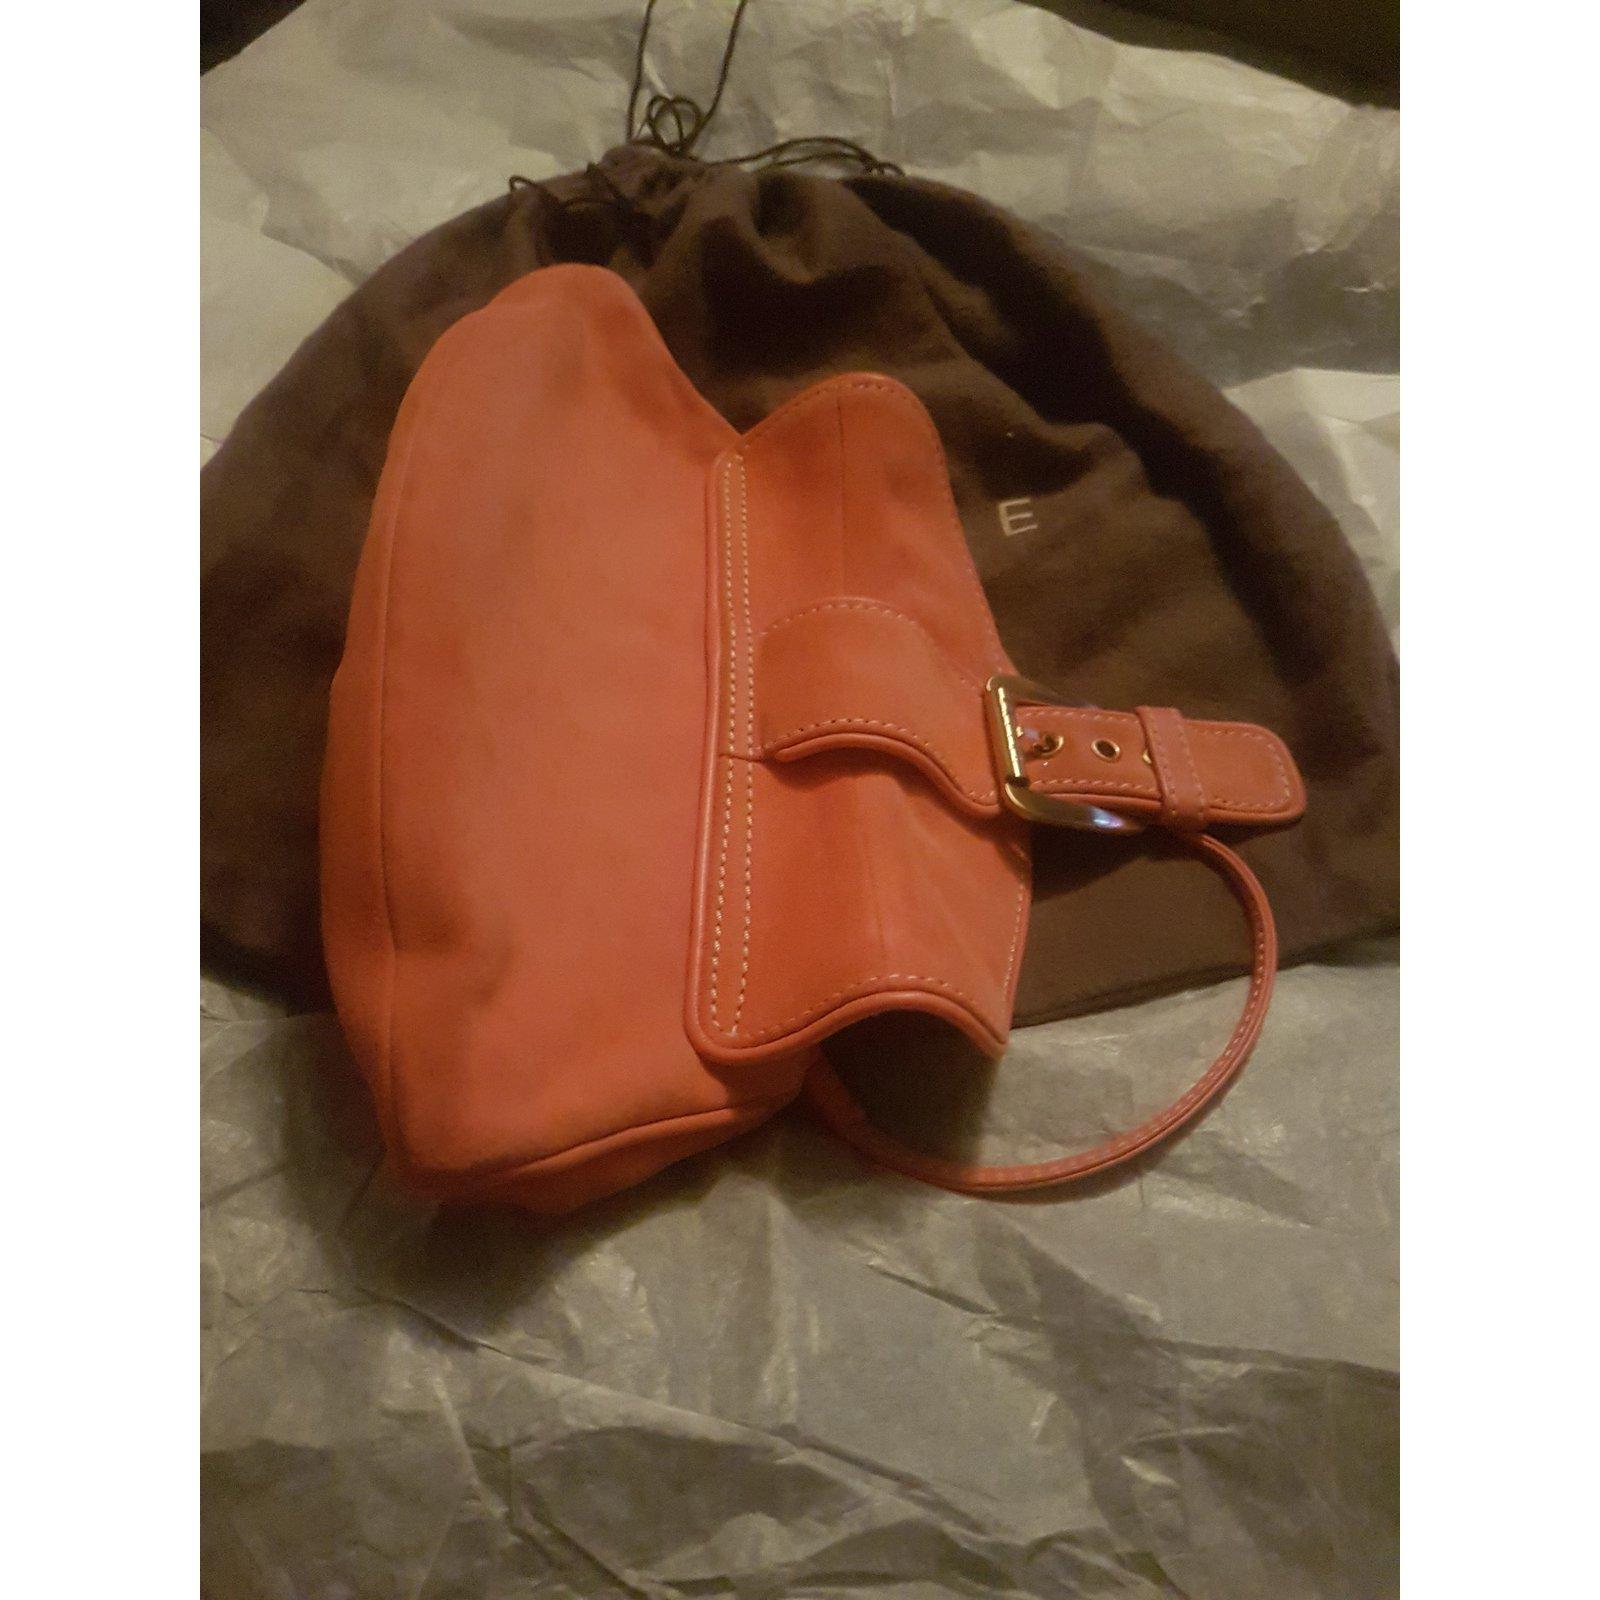 47744e4d40 Facebook · Pin This. Céline Clutch bags Clutch bags Suede Orange ref.53697